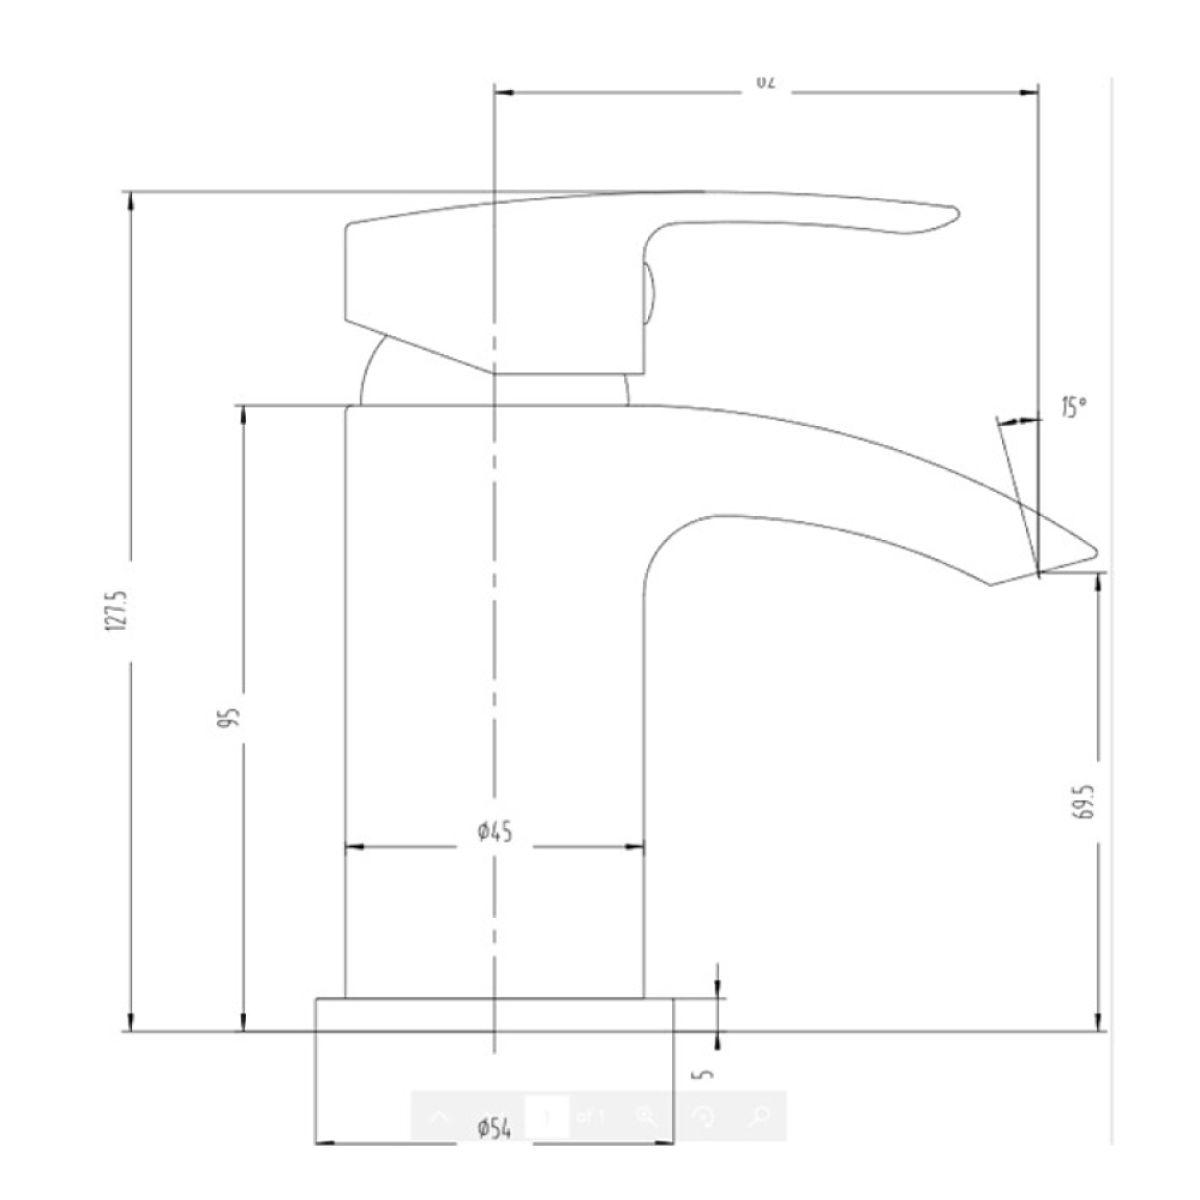 RAK Curve Chrome Mini Mono Basin Mixer Tap with Waste Measurements